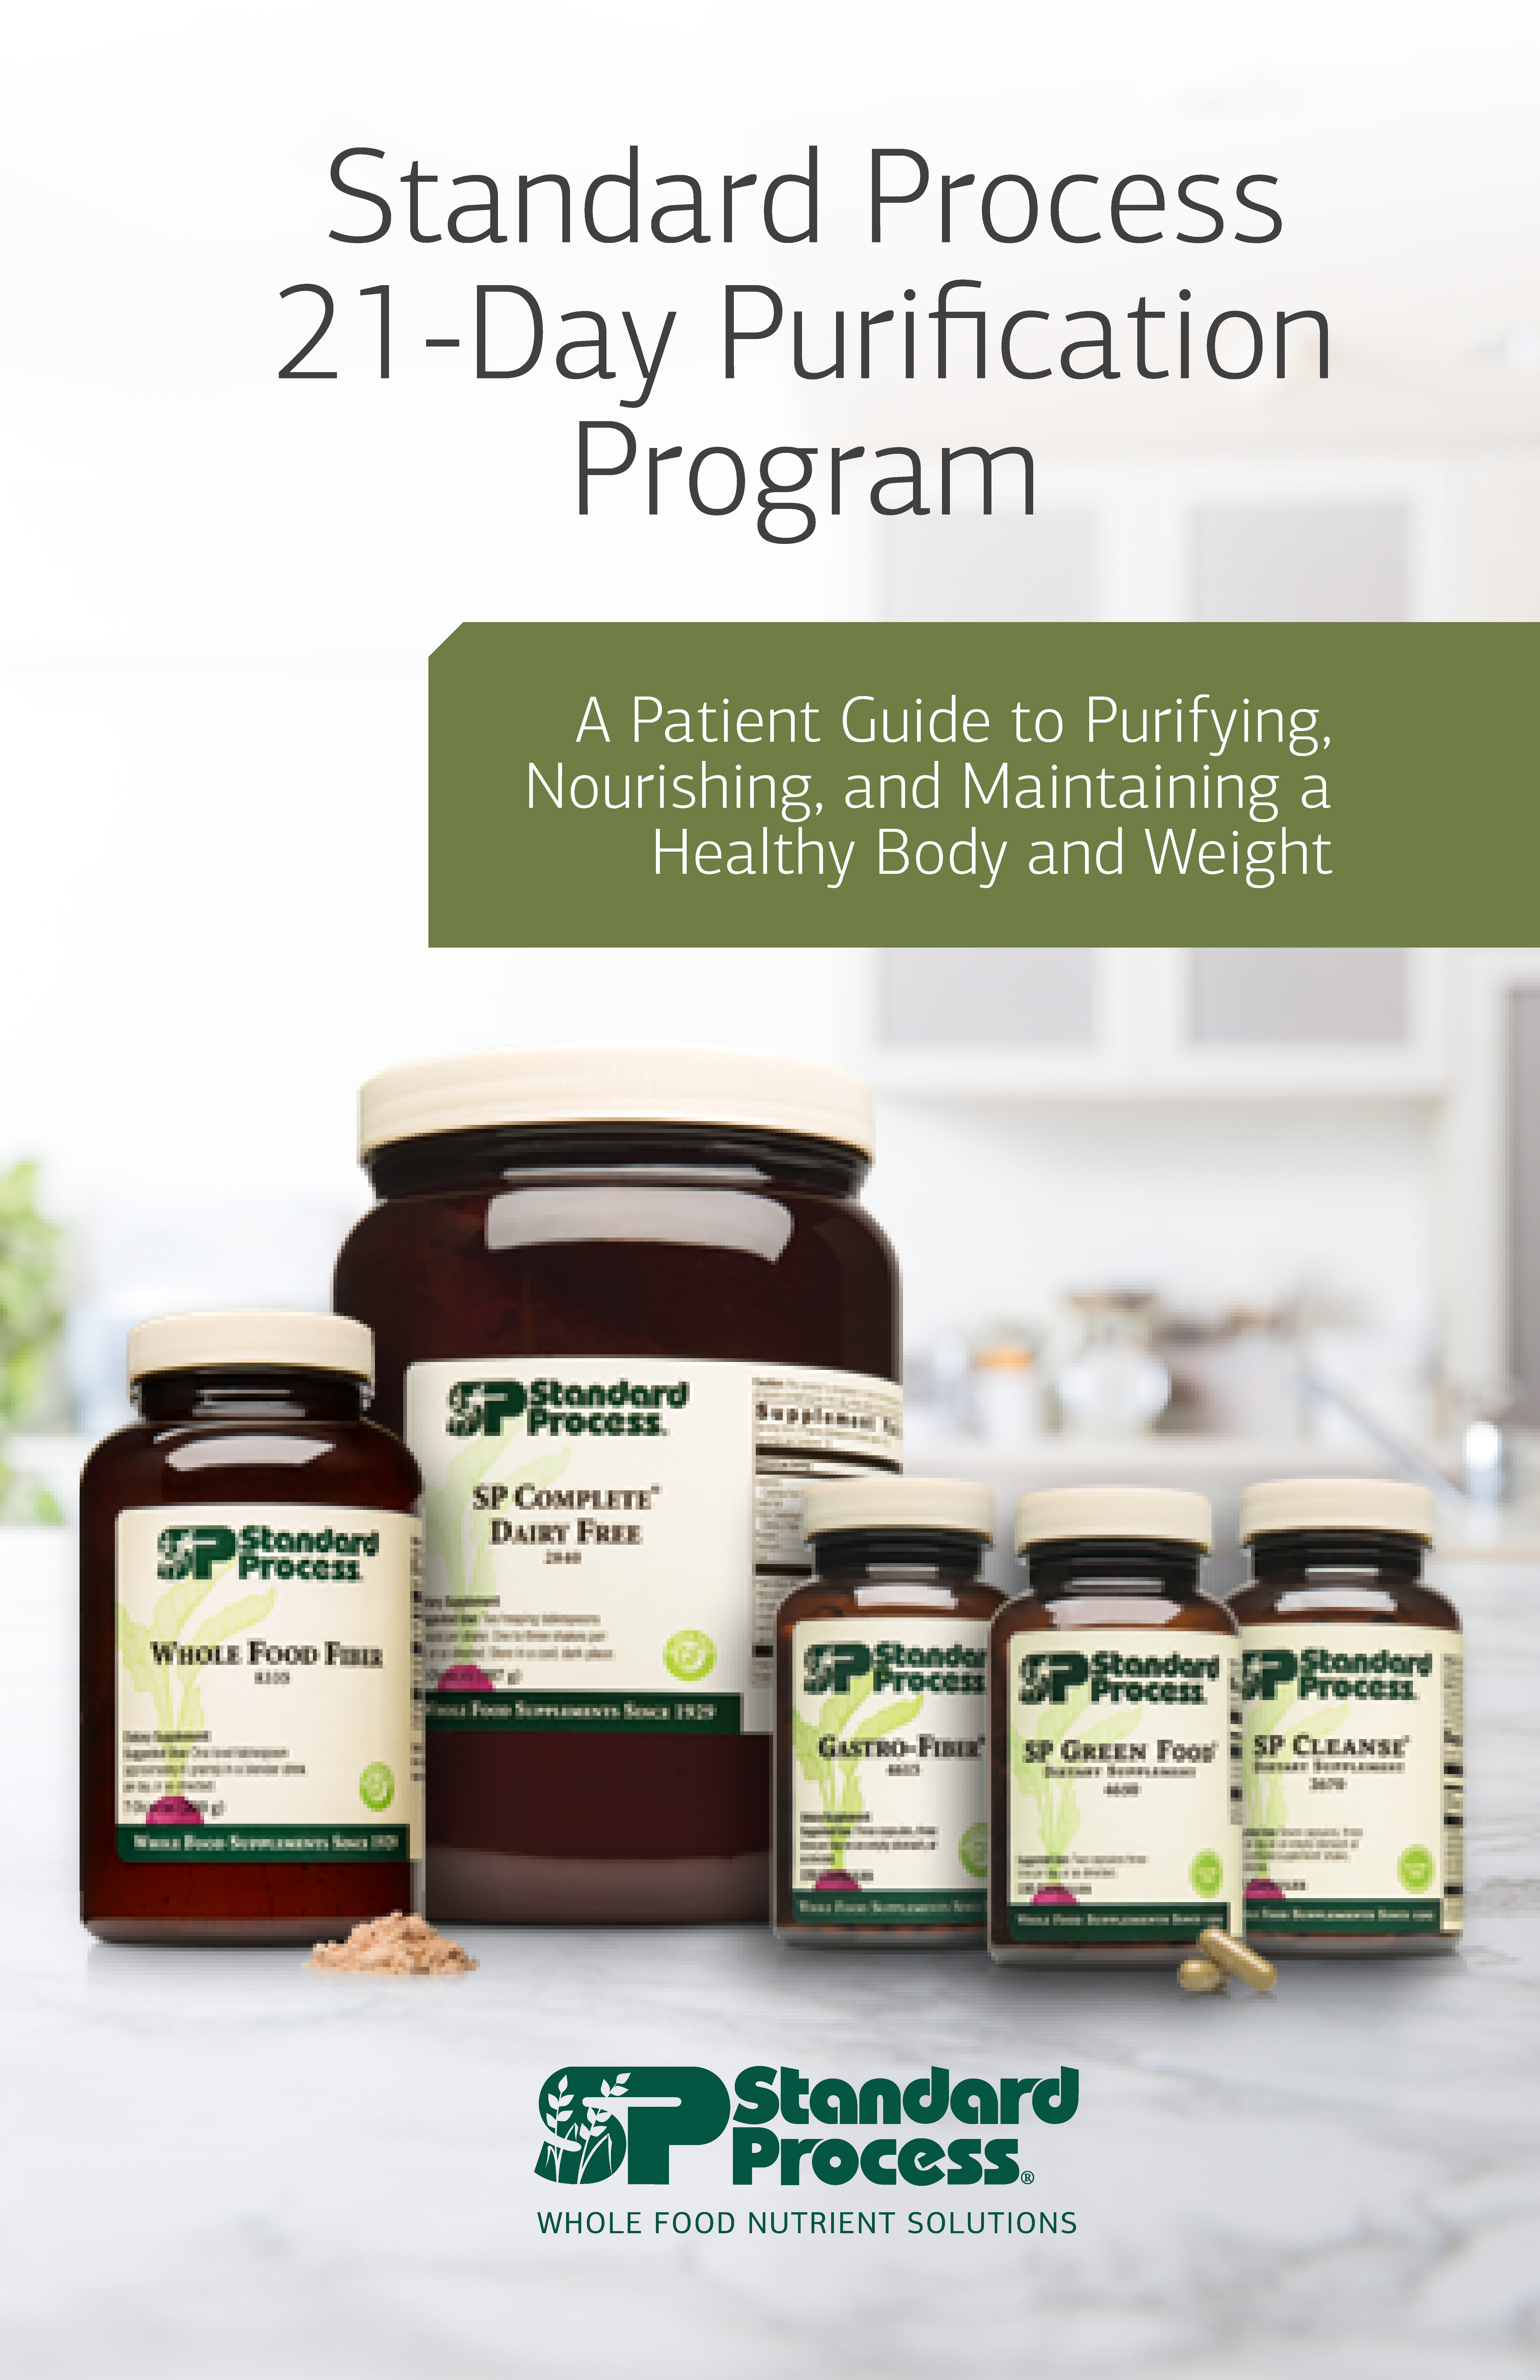 Standard Process 21-Day Purification Program